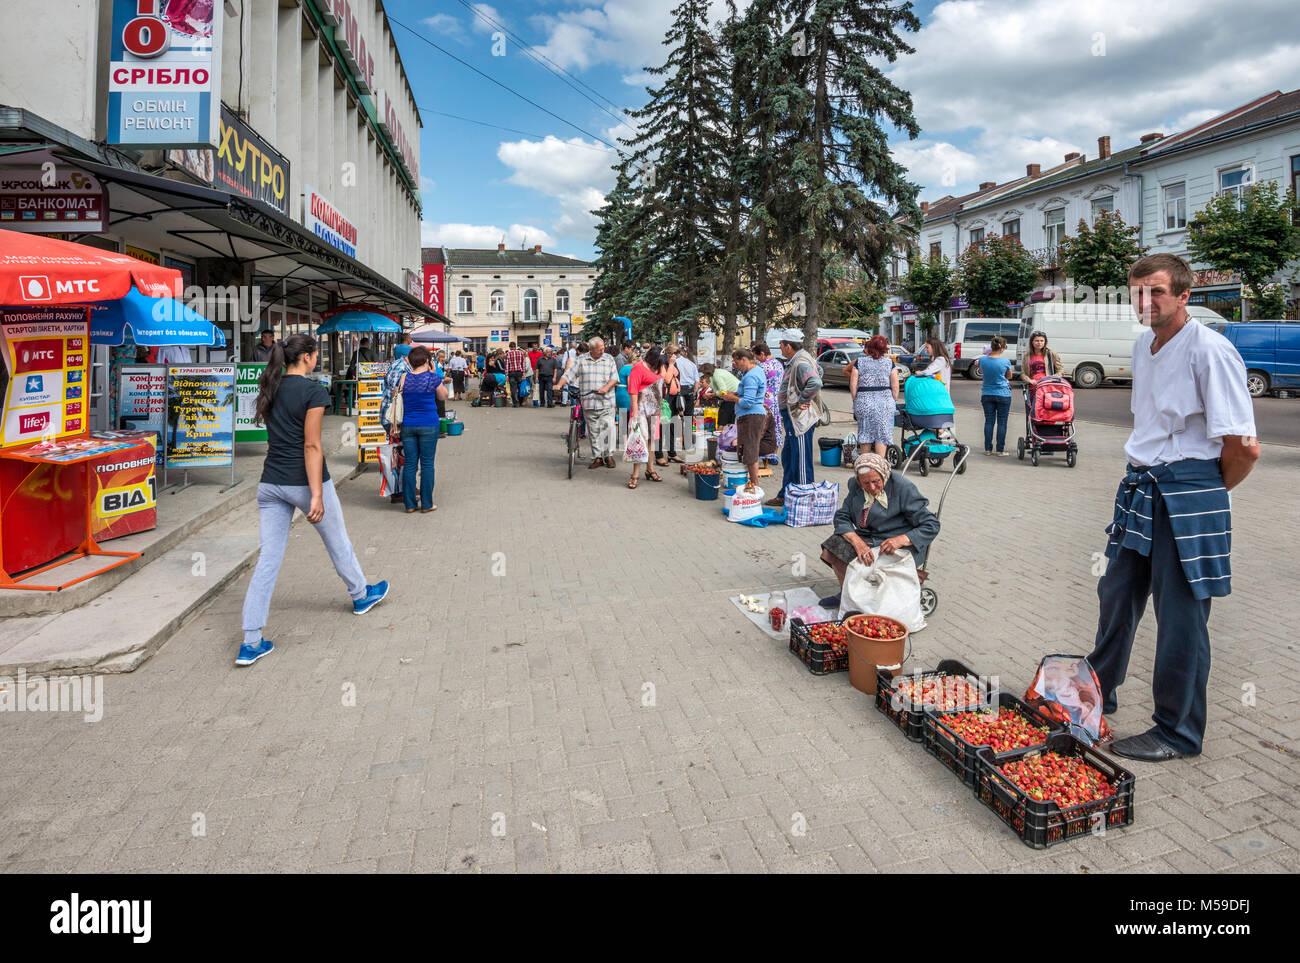 Street market at Taras Shevchenko Street in Kolomyia, Pokuttya, Prykarpattia region, Ivano-Frankivsk Oblast, Ukraine - Stock Image